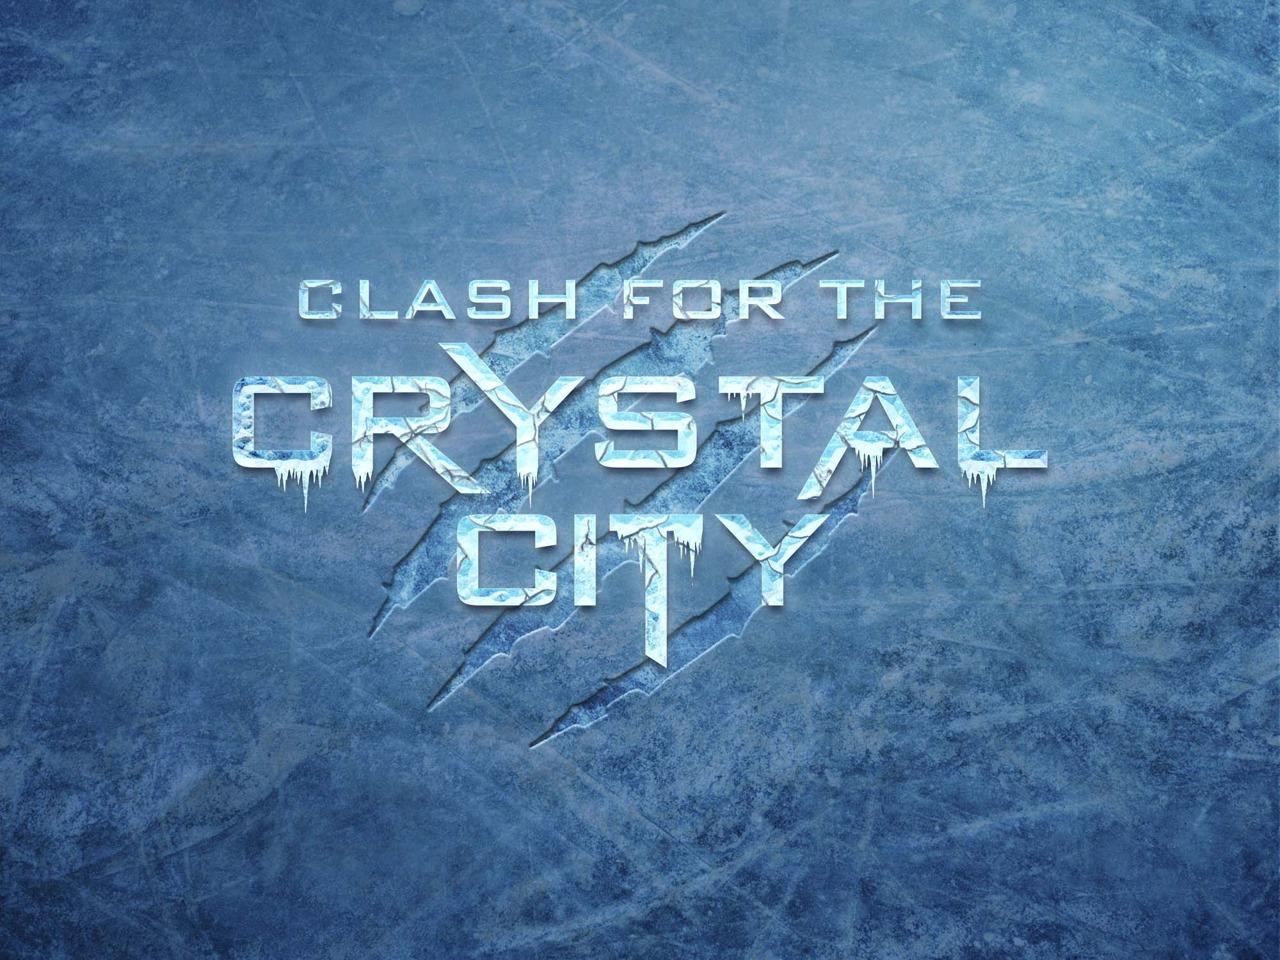 Круизный лайнер Quantum of the Seas - RCI_OA_Clash_for_the_Crystal_City_Artwork_LR.JPG